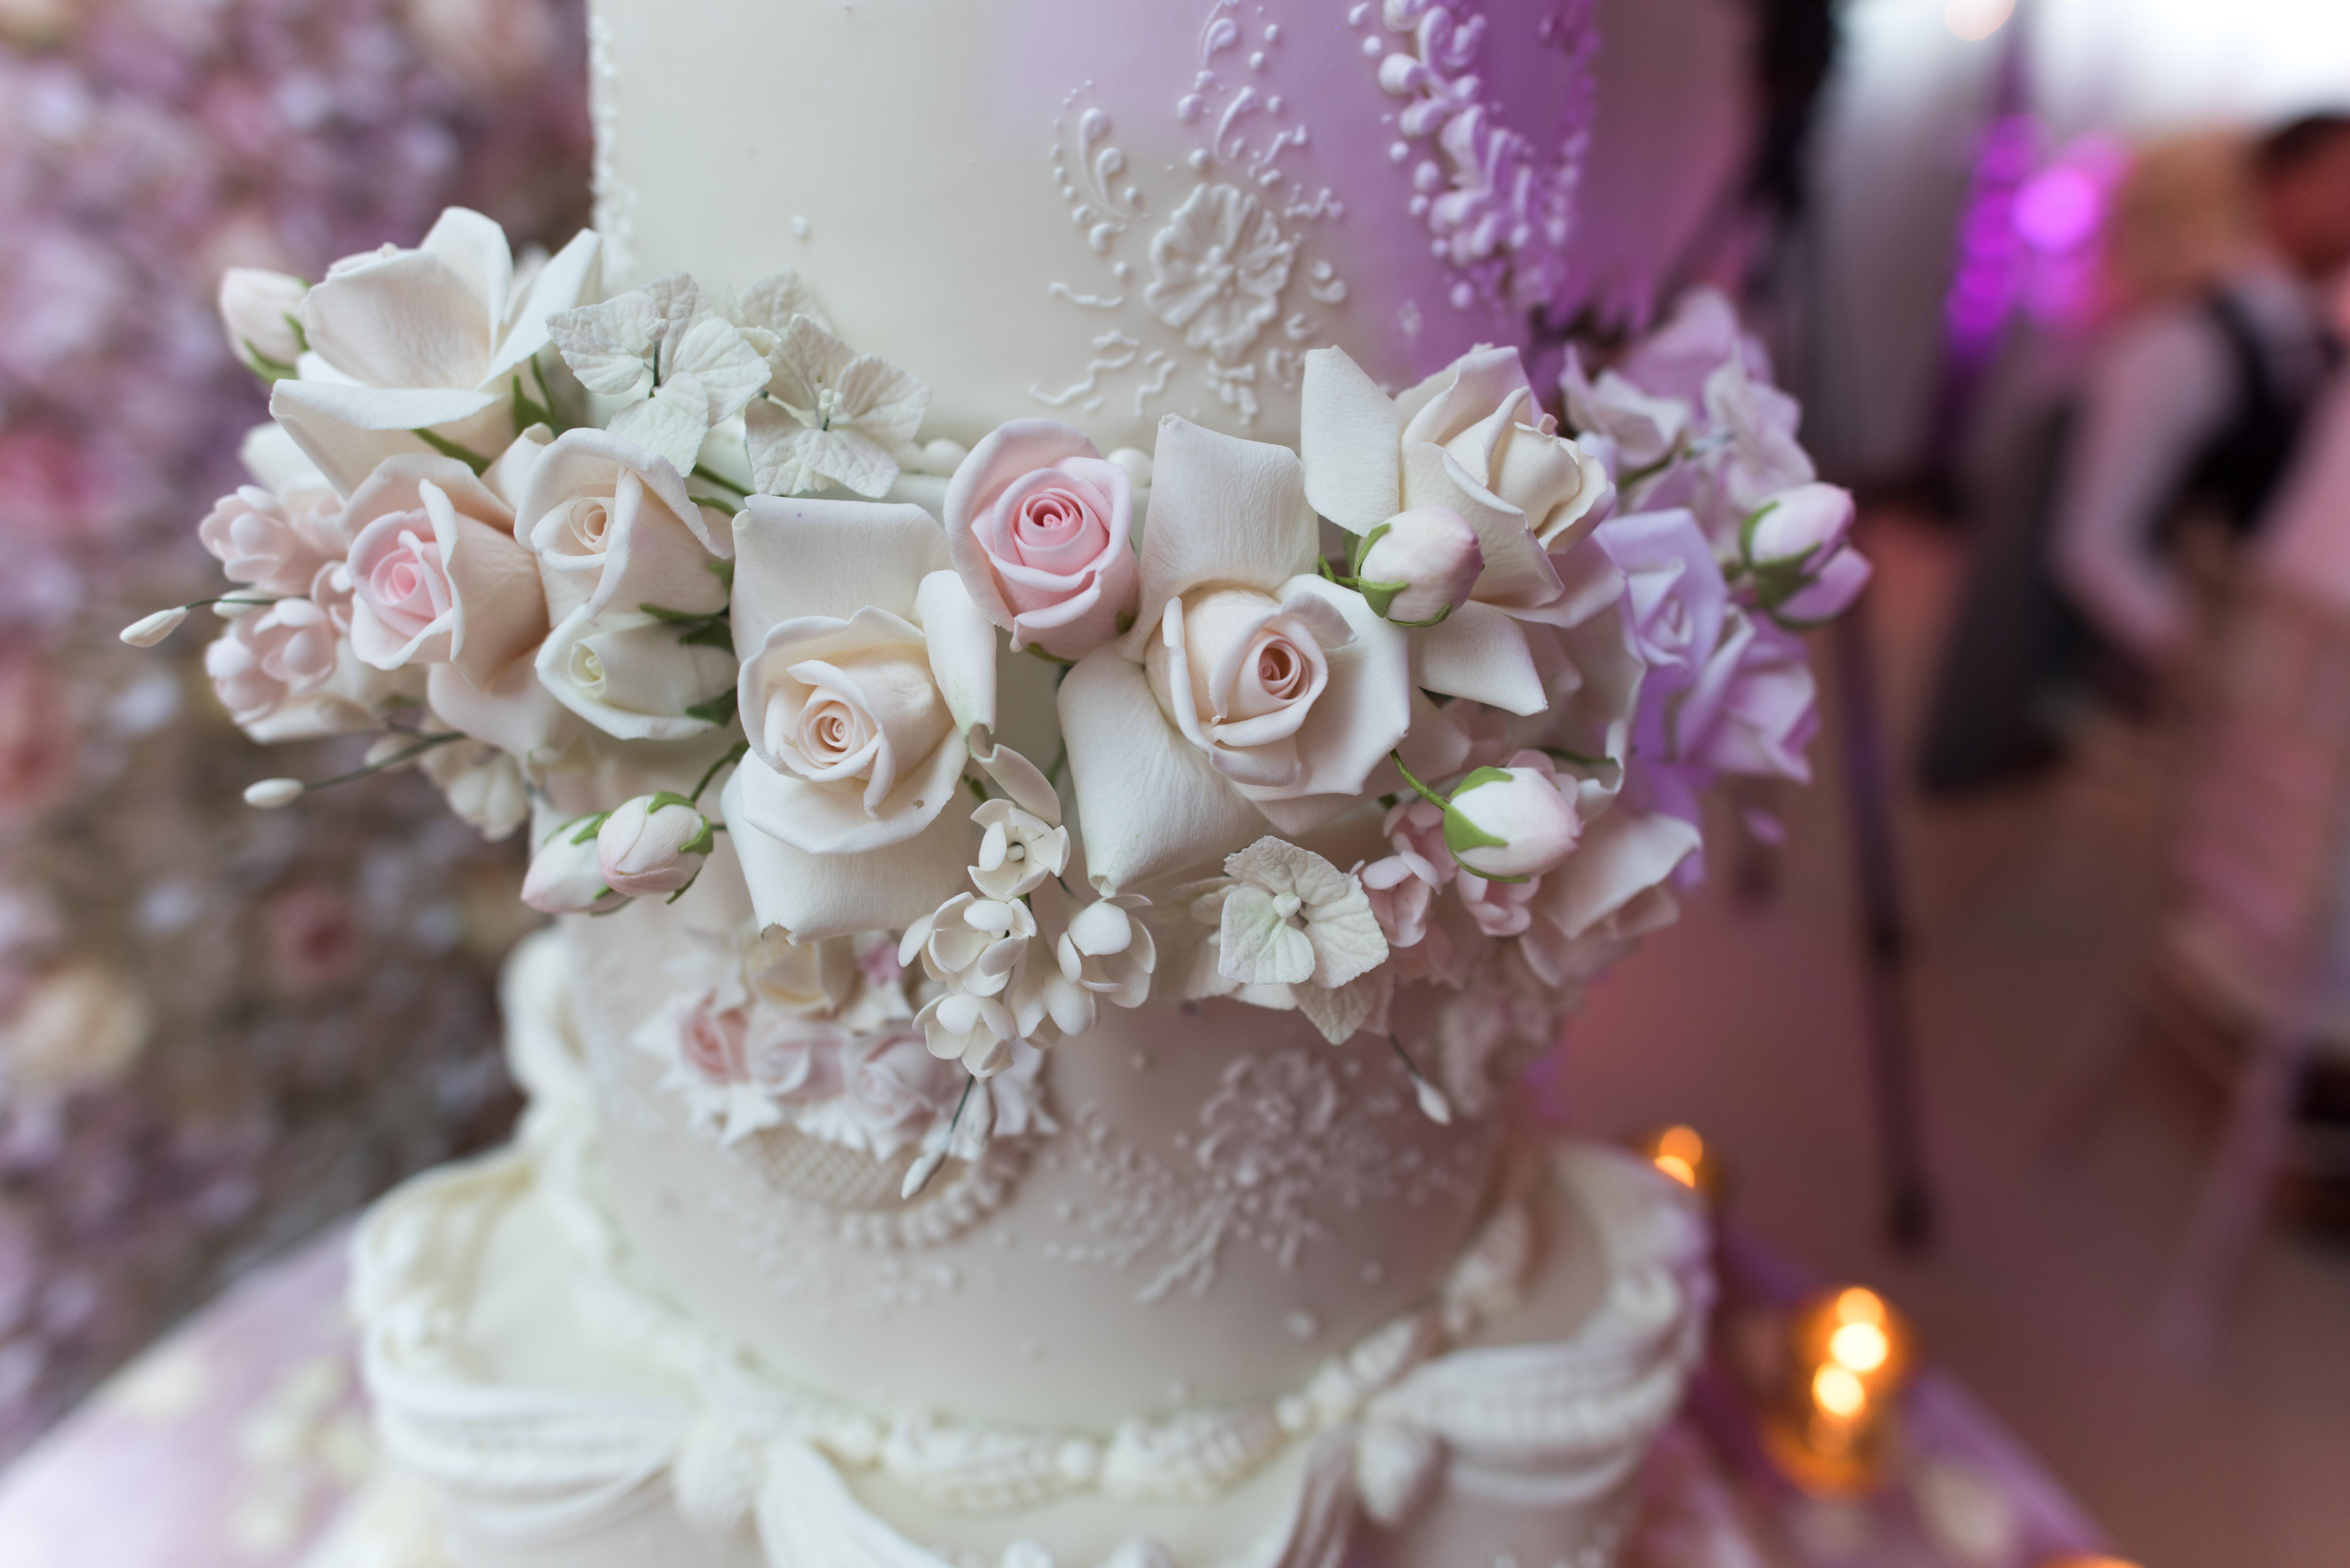 Mouthwatering white chocolate wedding treats